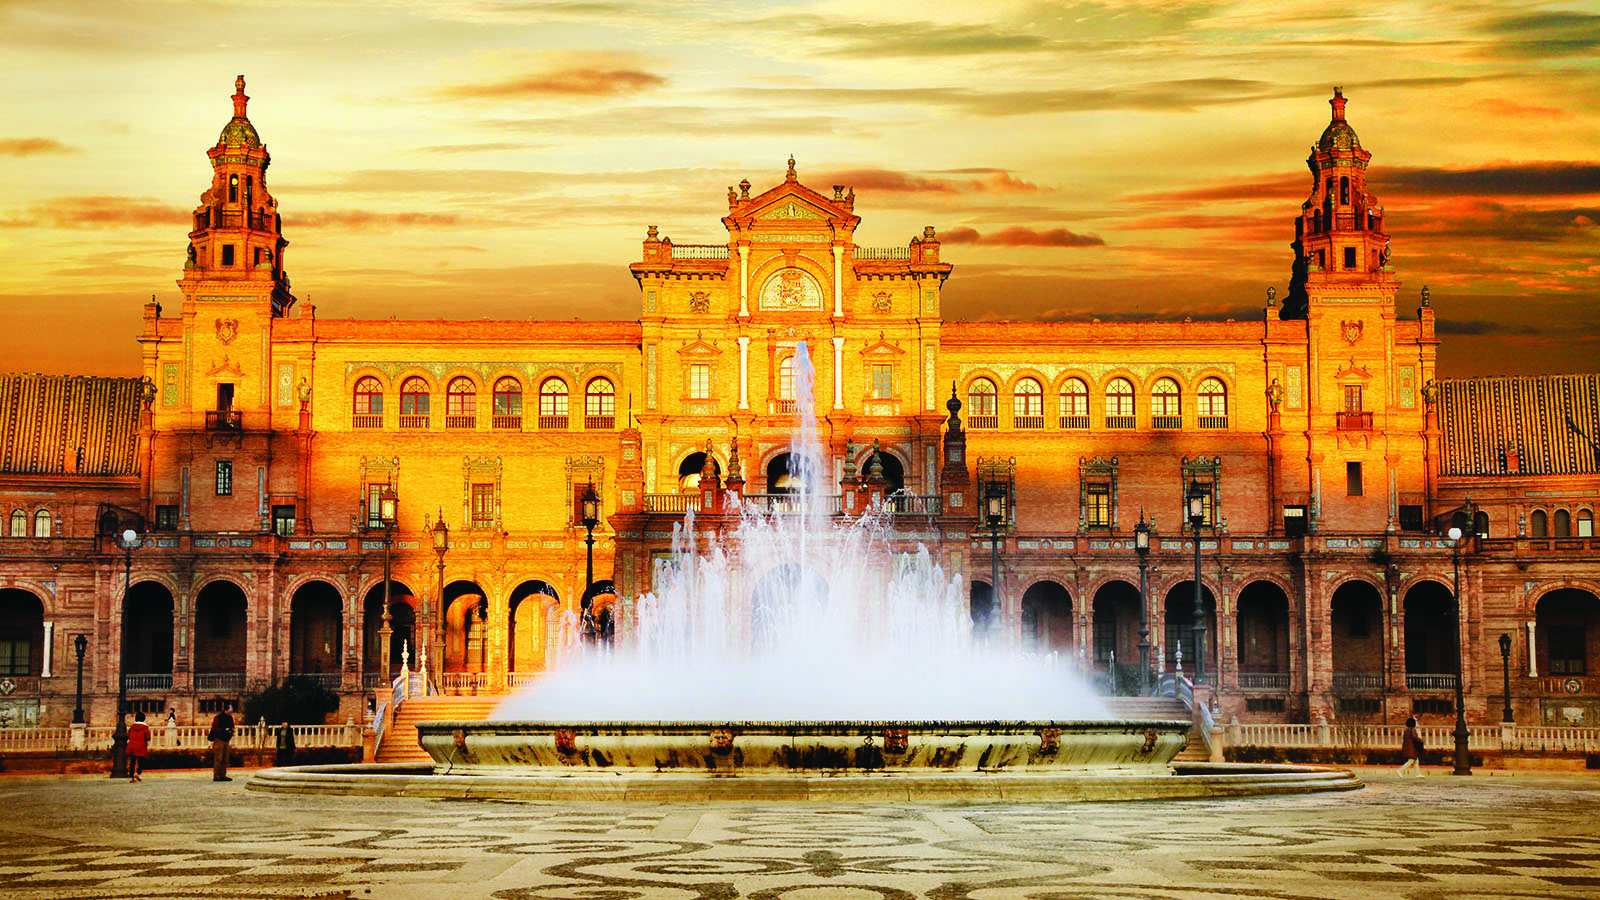 Gap Year Program - CIEE Gap Year Abroad: Global Internship in Seville, Spain  1